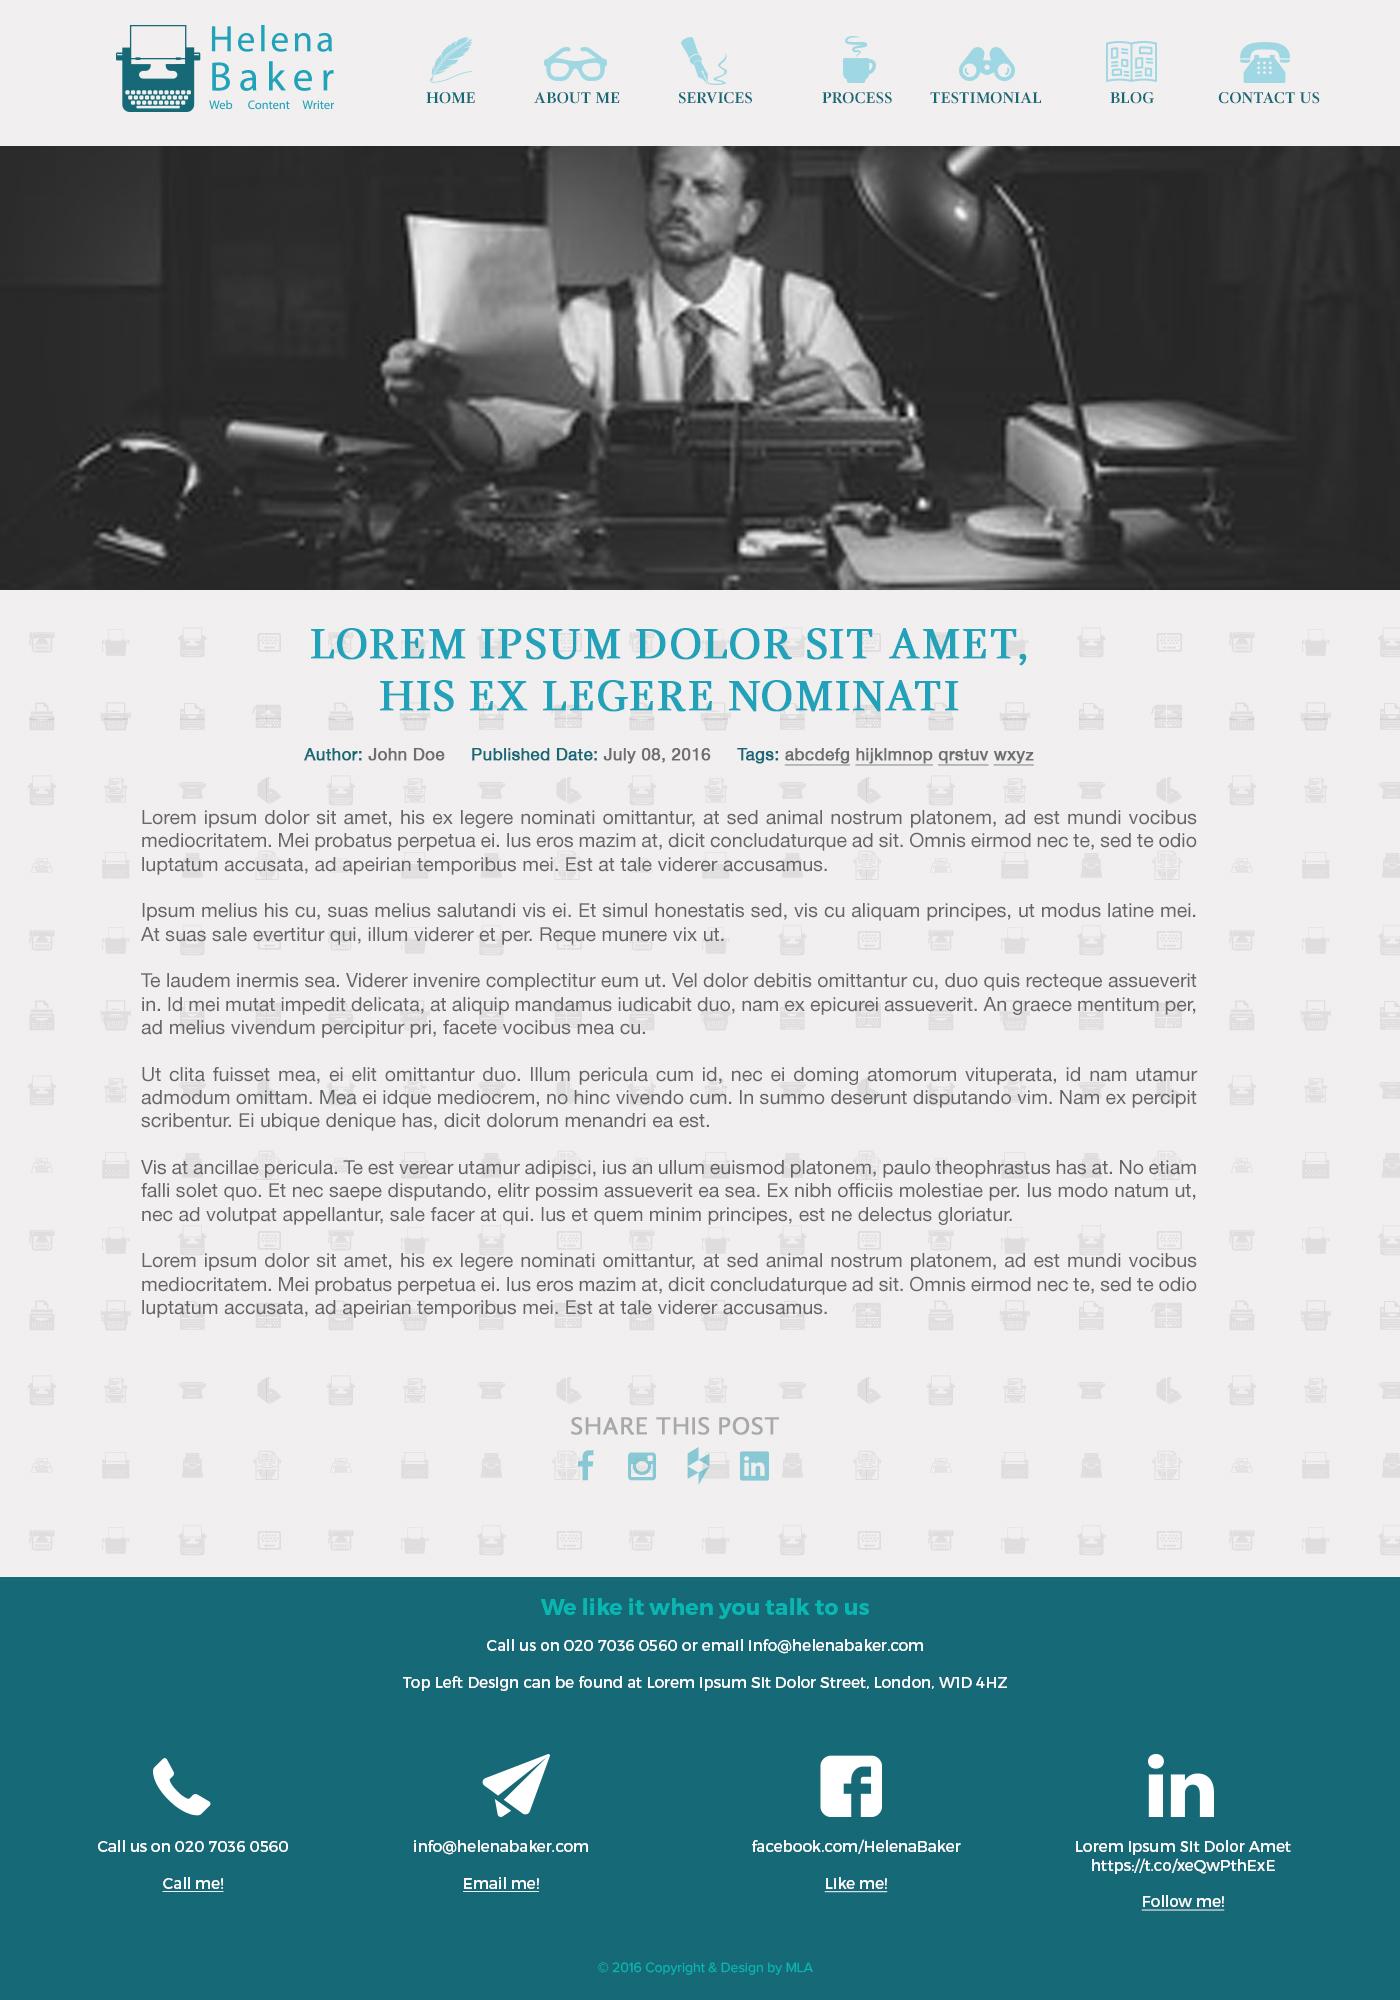 helena baker website design